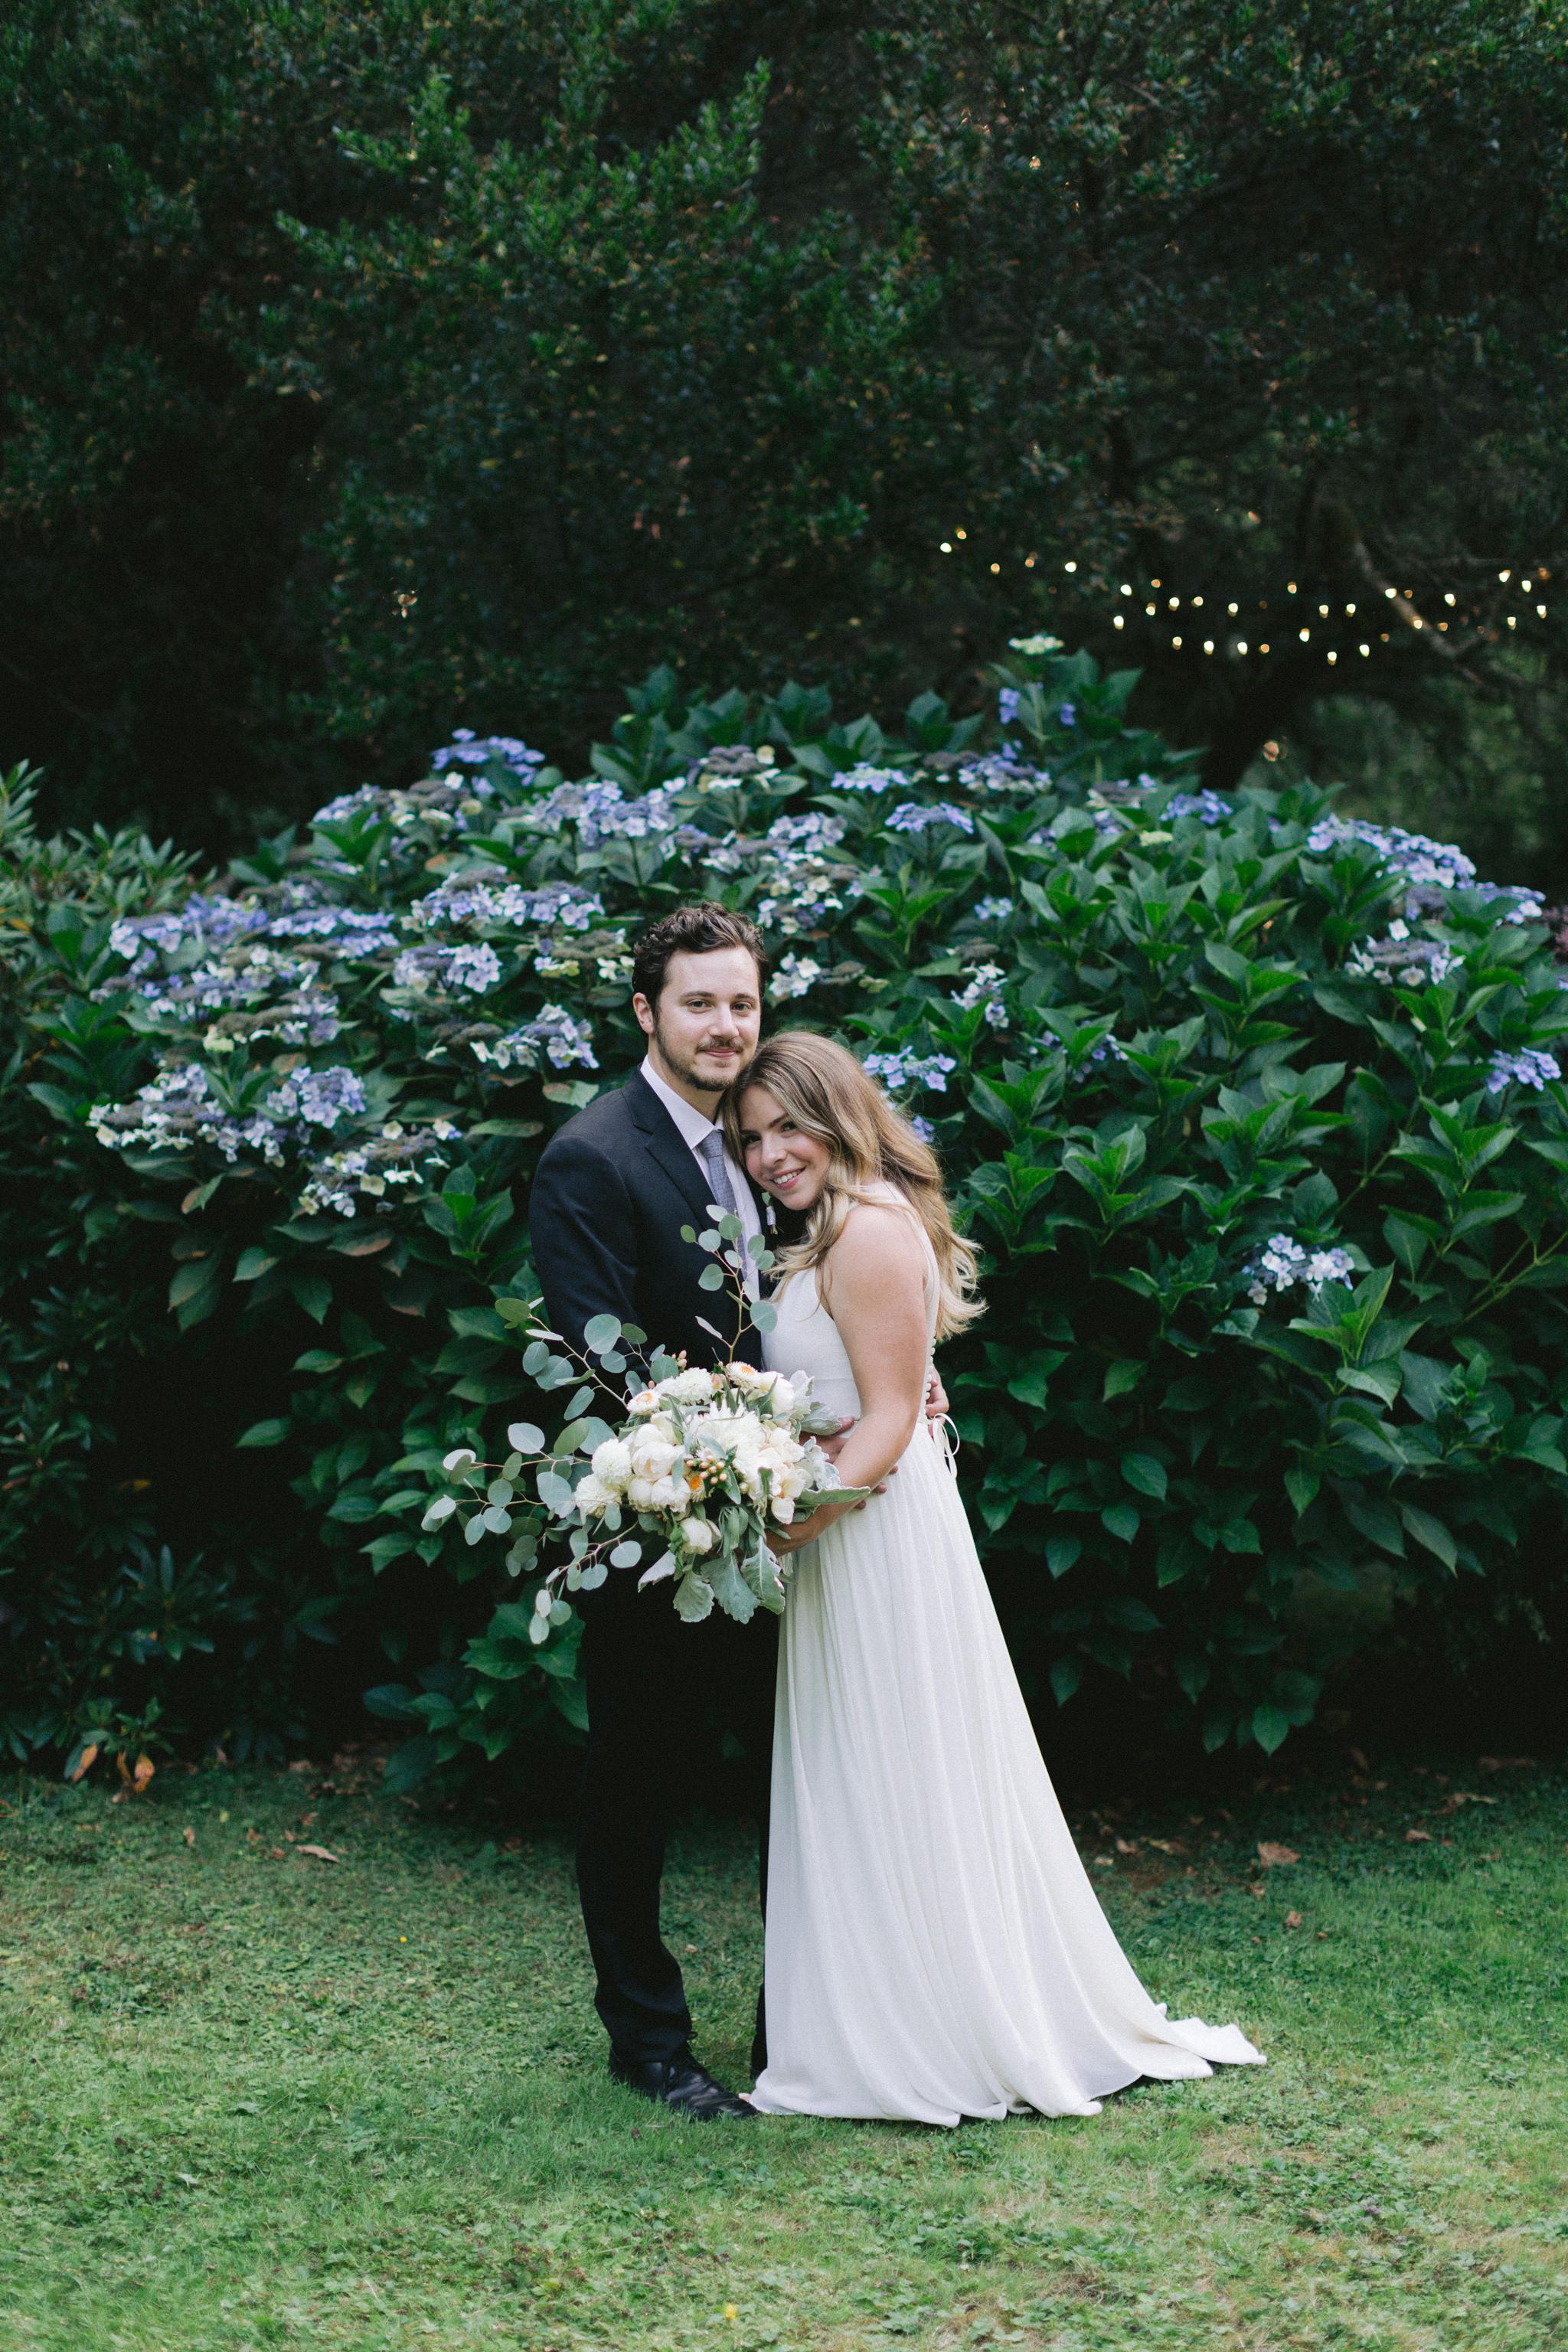 Backyard-Bainbridge-Island-Wedding-Alycia-Lovell-Photography-172.JPG